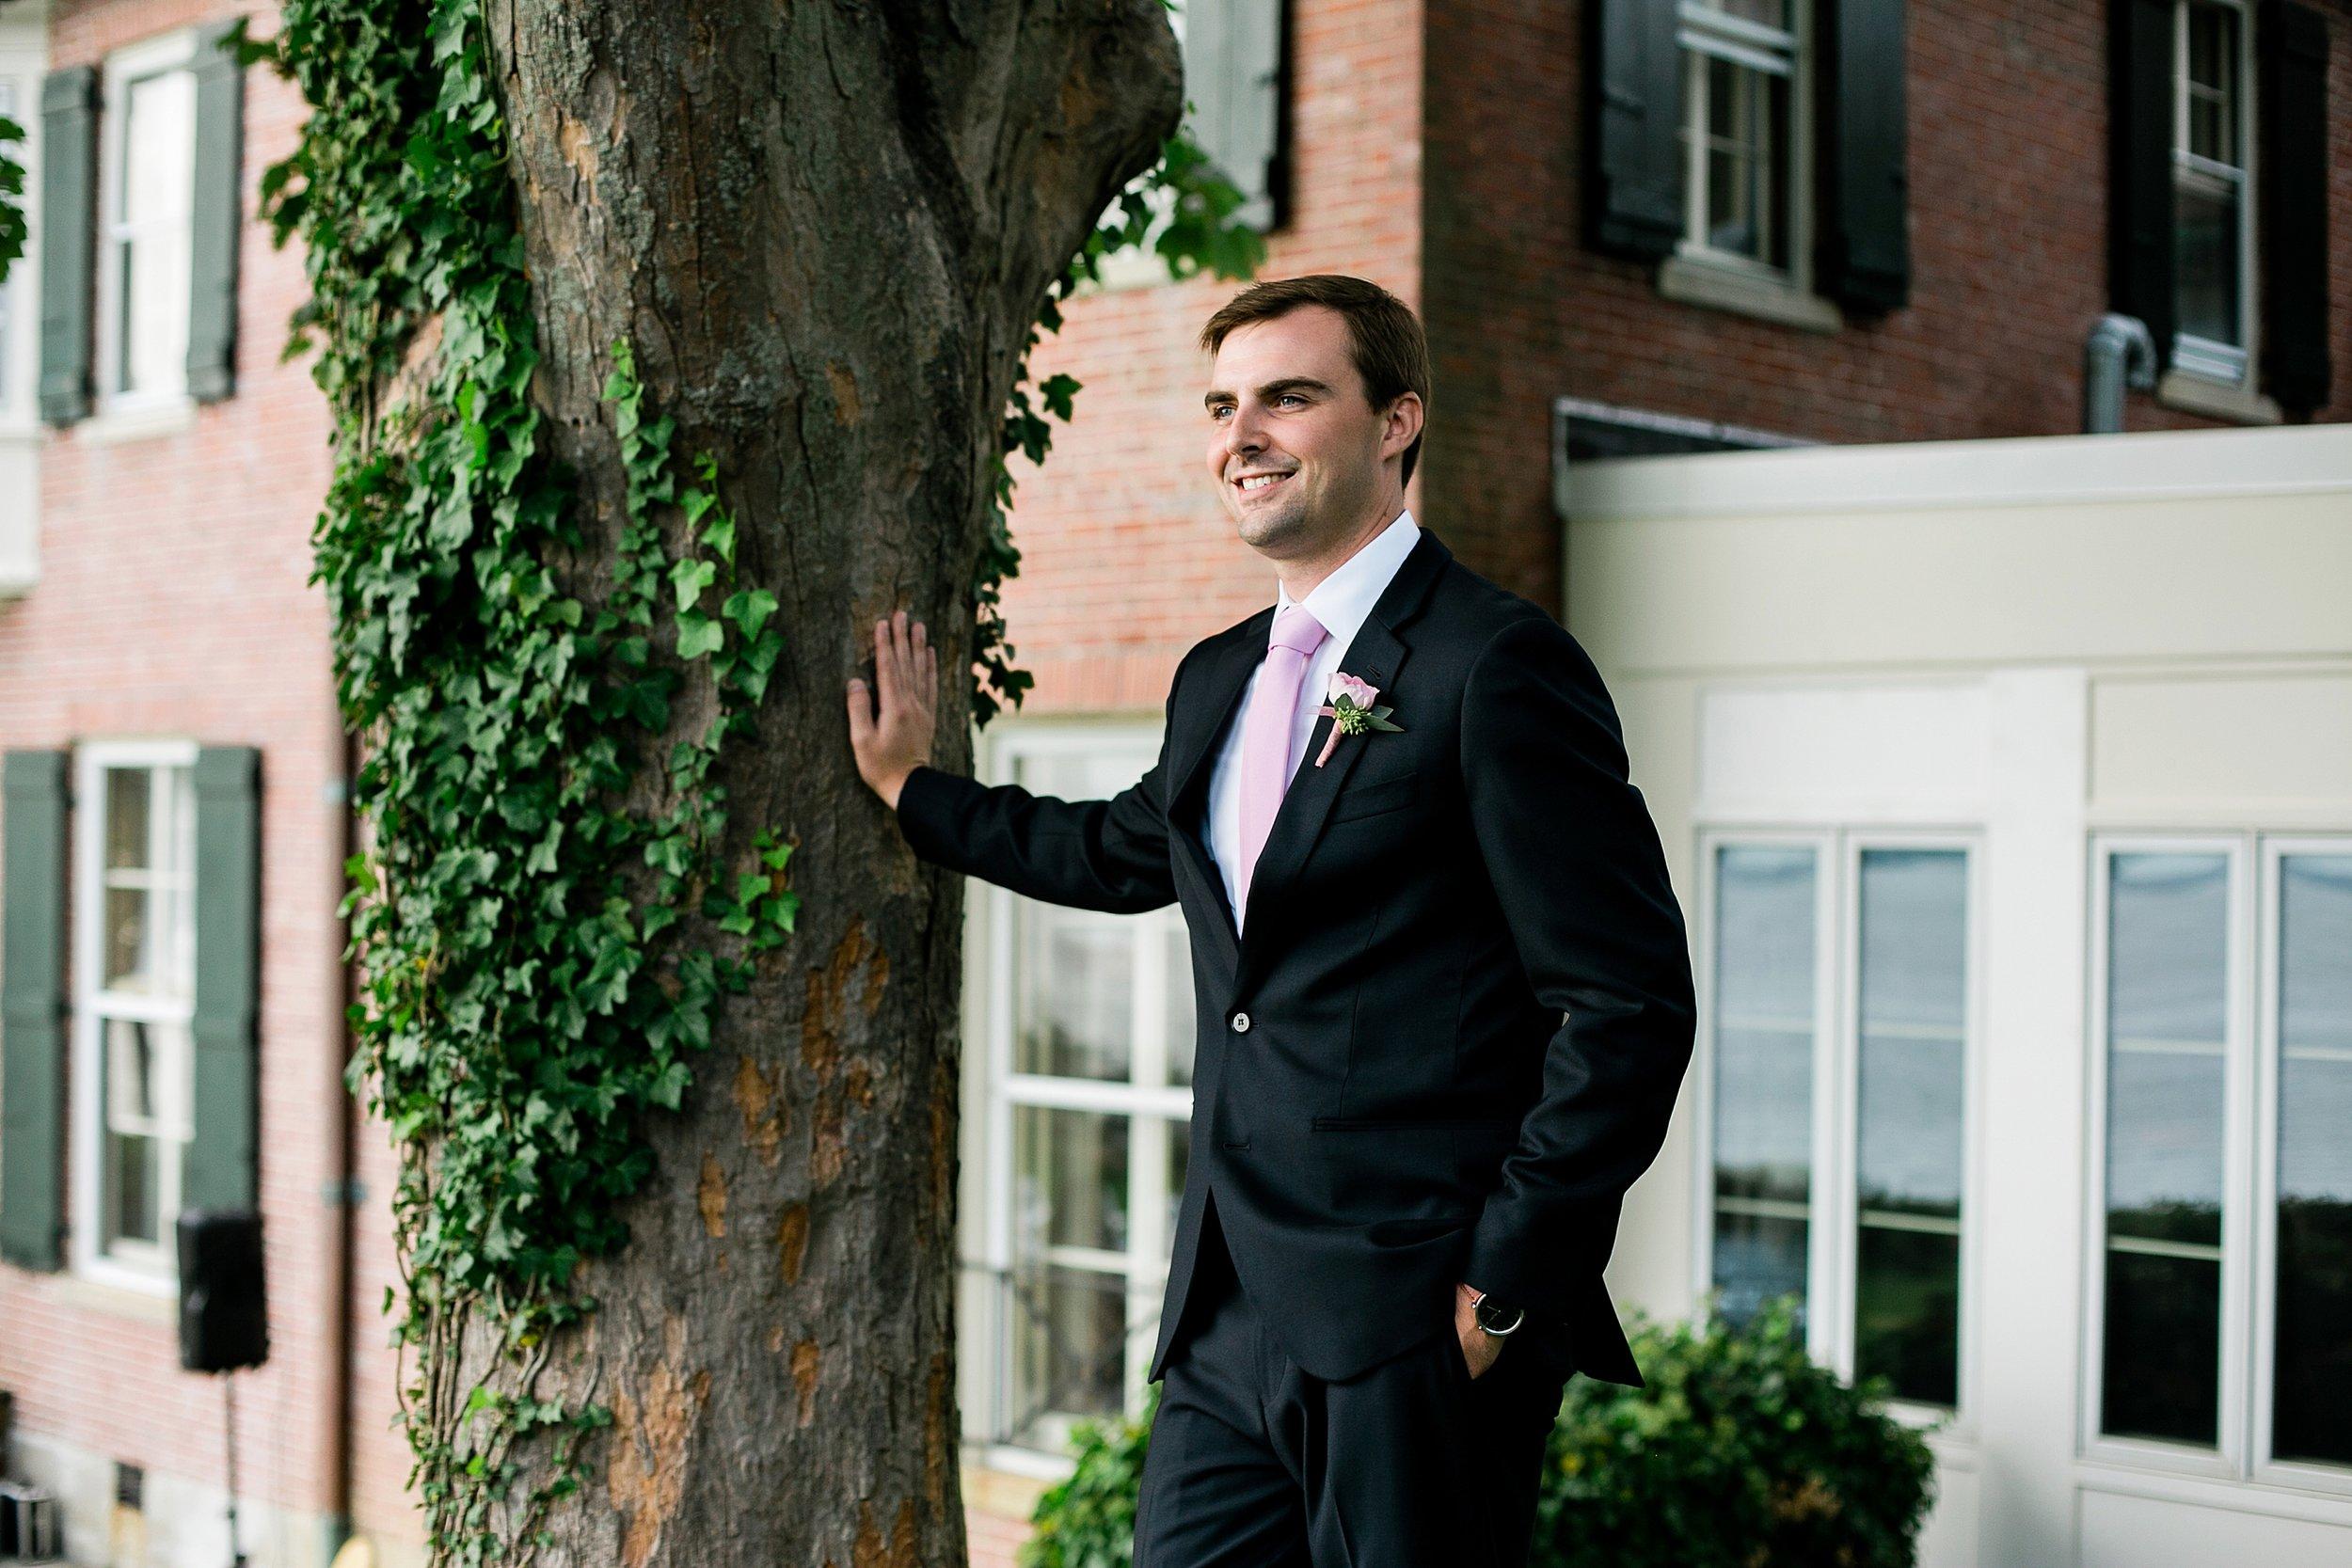 012 los angeles wedding photographer todd danforth photography boston.jpg